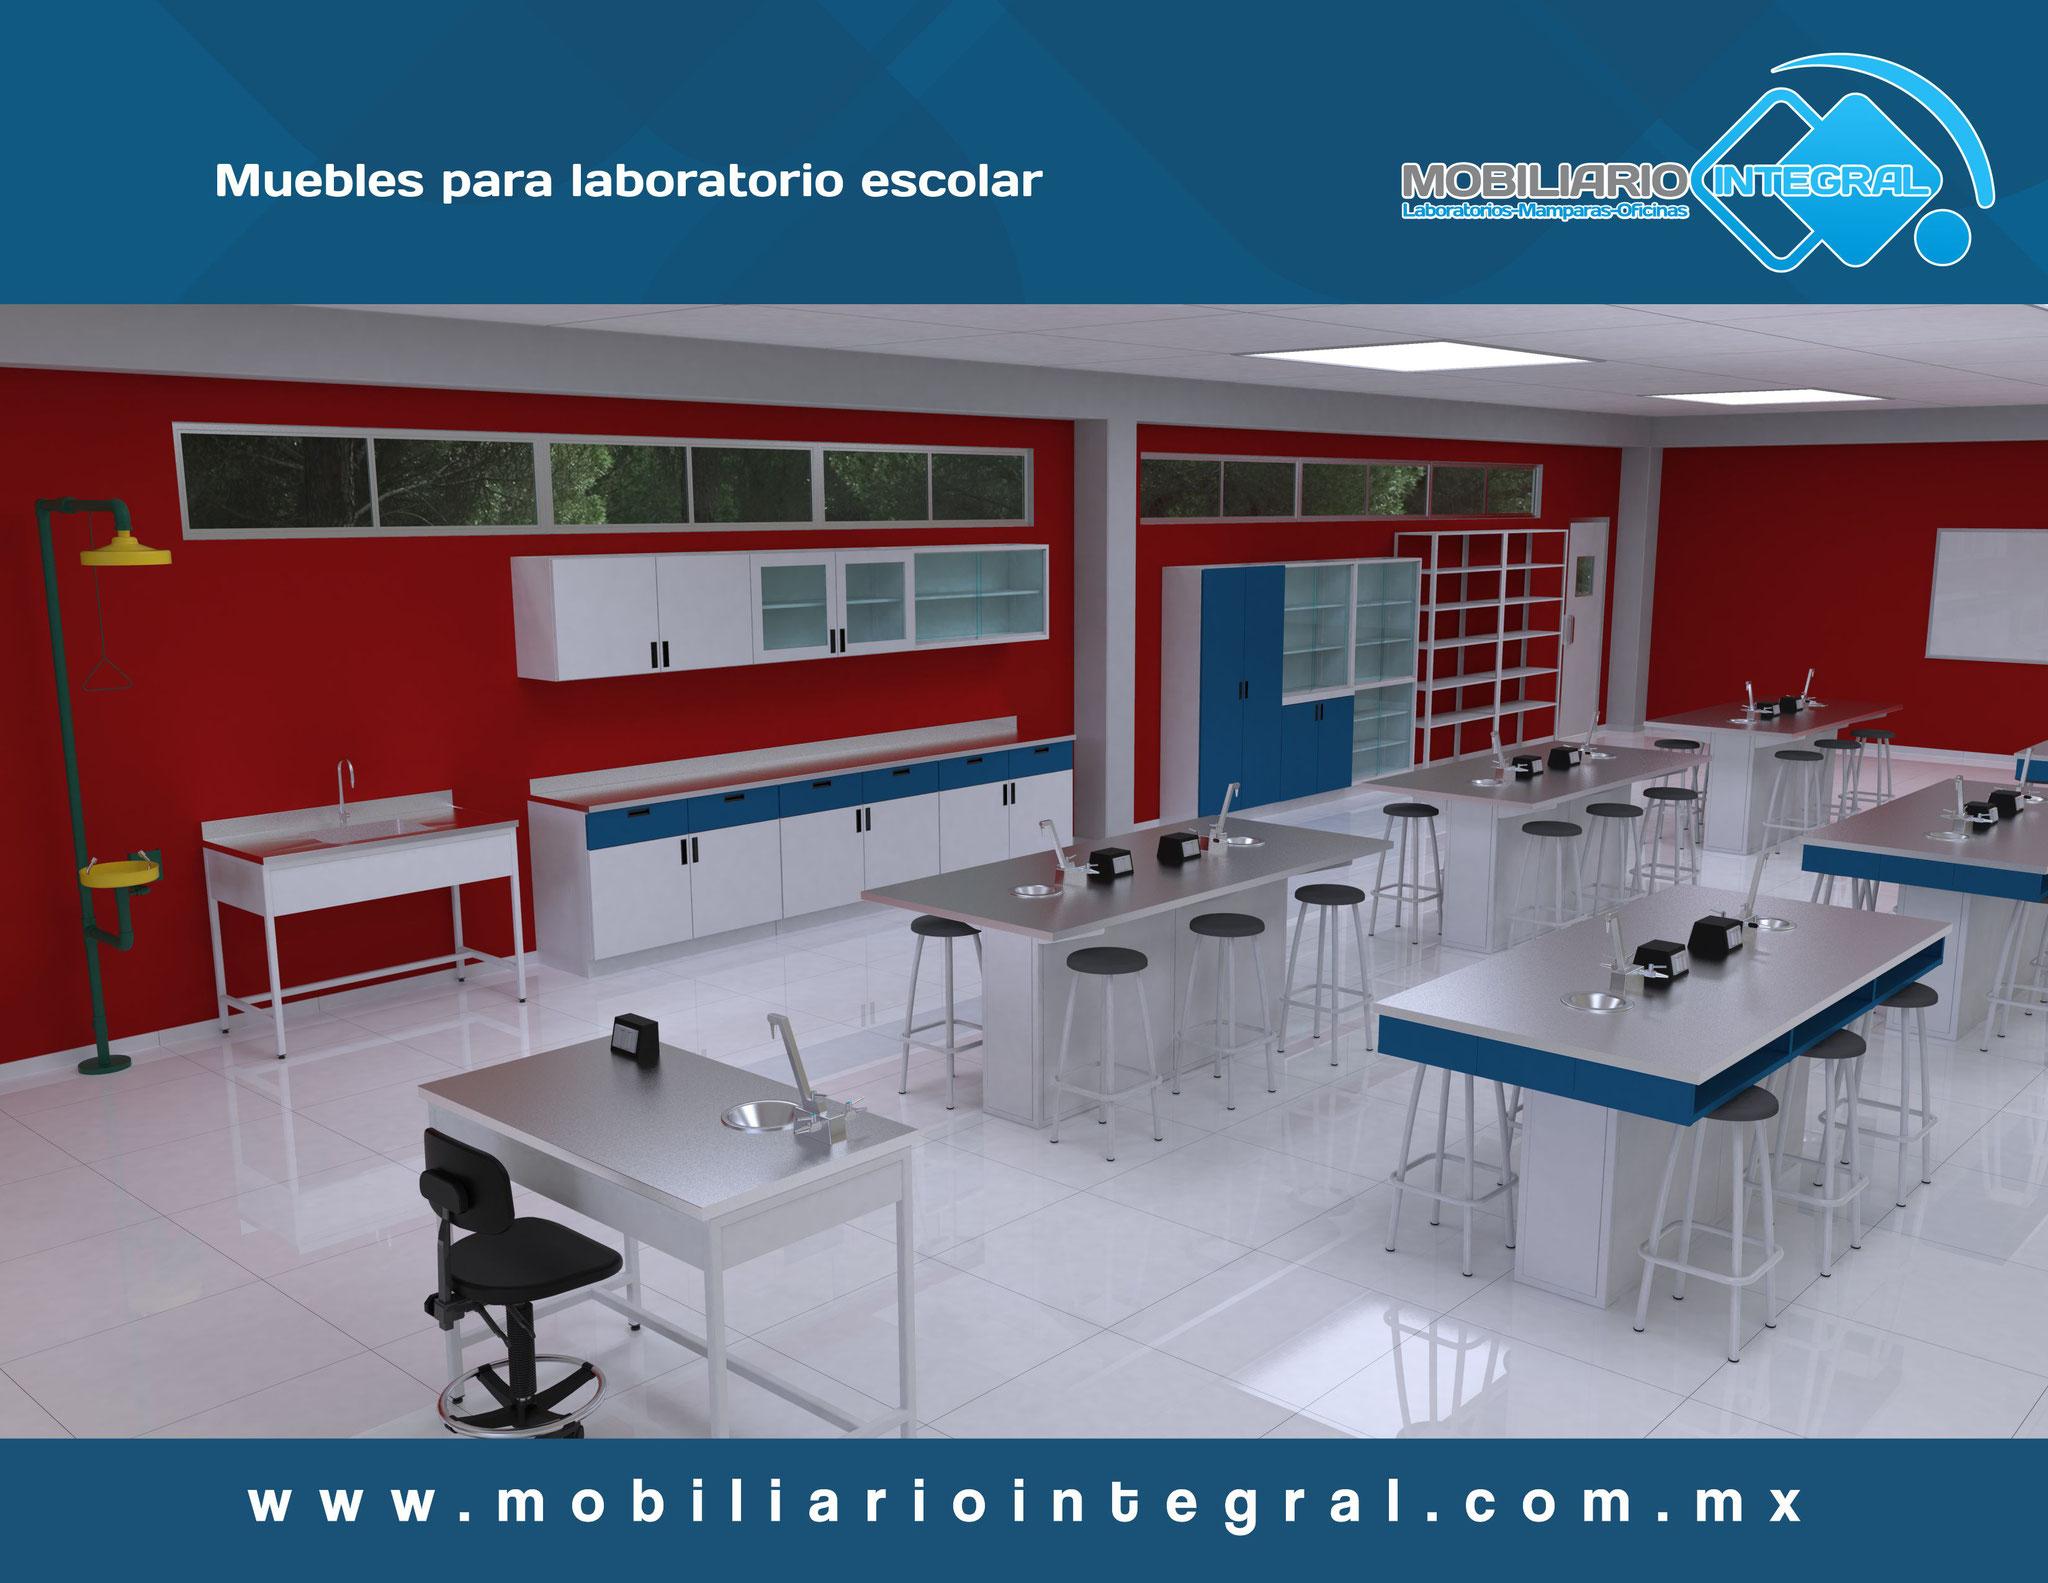 Muebles para laboratorio escolar Guanajuato